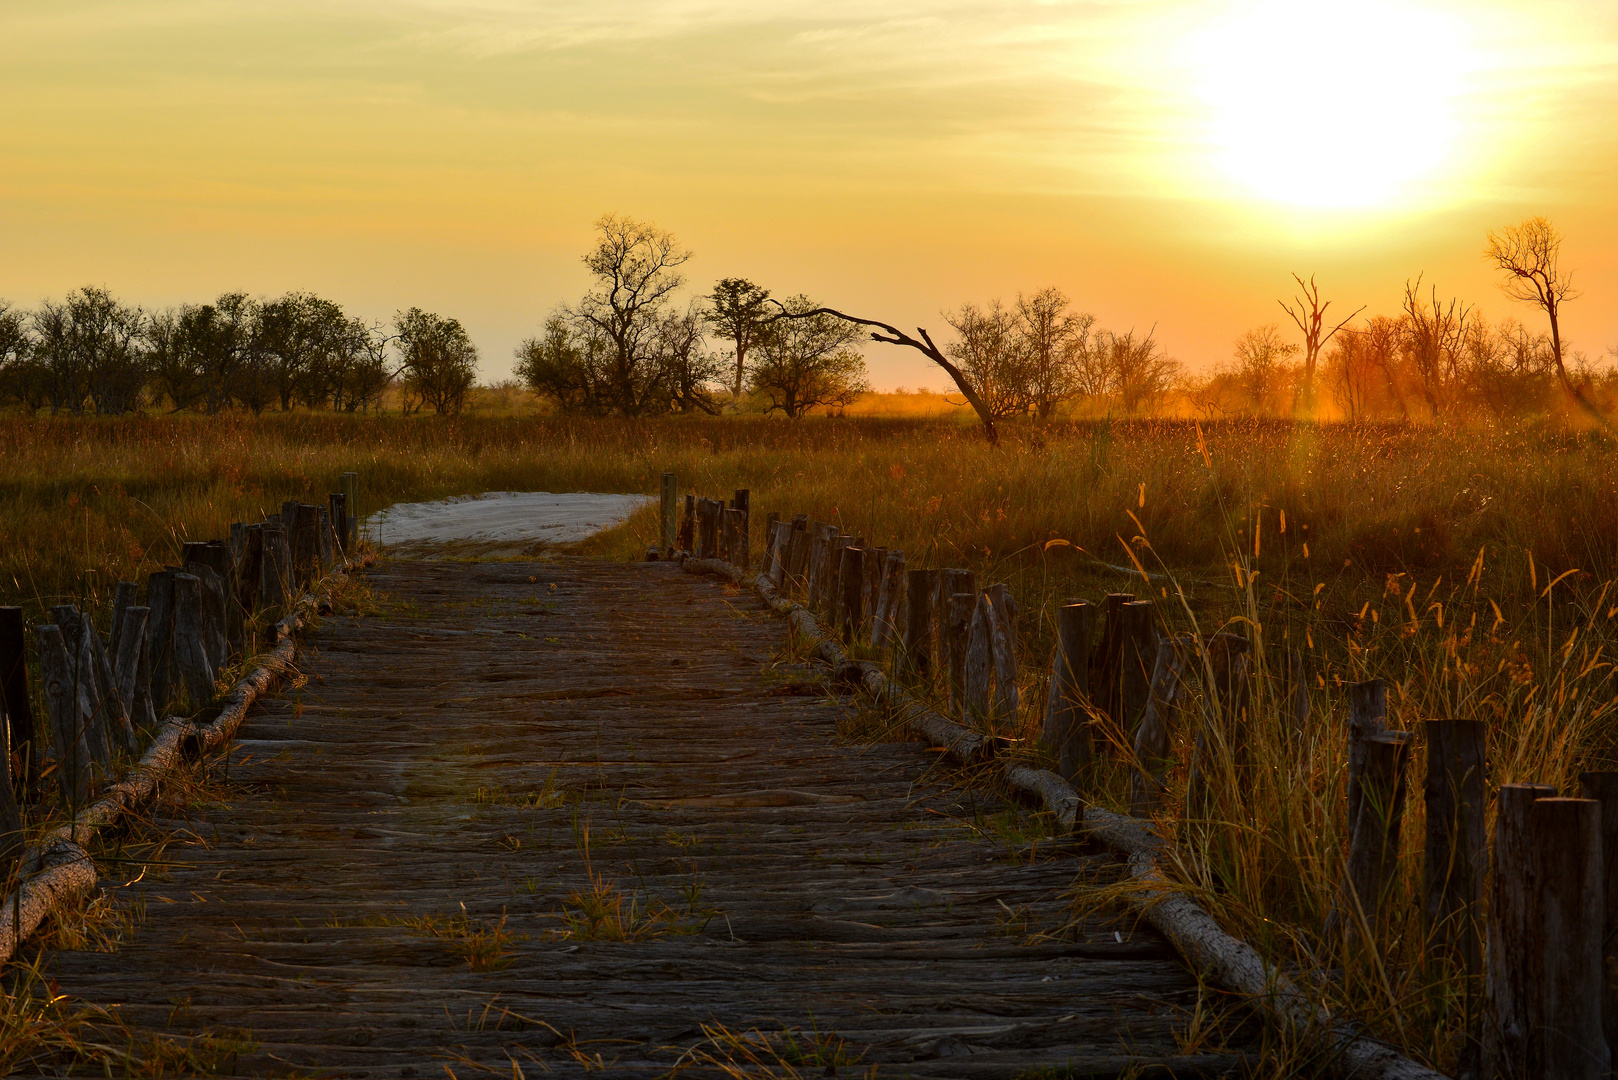 Third Bridge Moremi Nationalpark